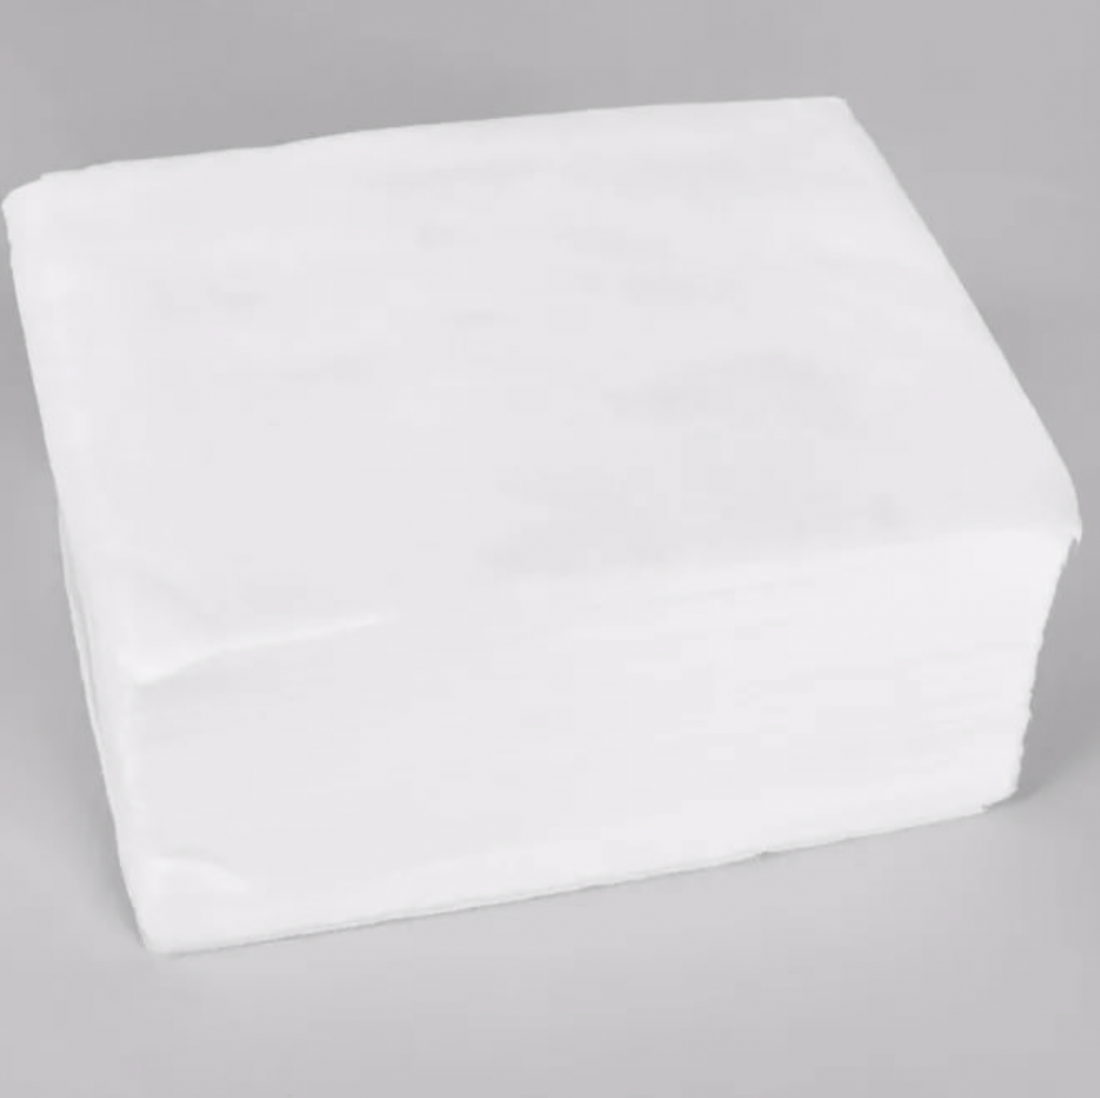 "White line""Выбор"" Одноразовые полотенца 30*30 спанлейс белый (50 шт)"